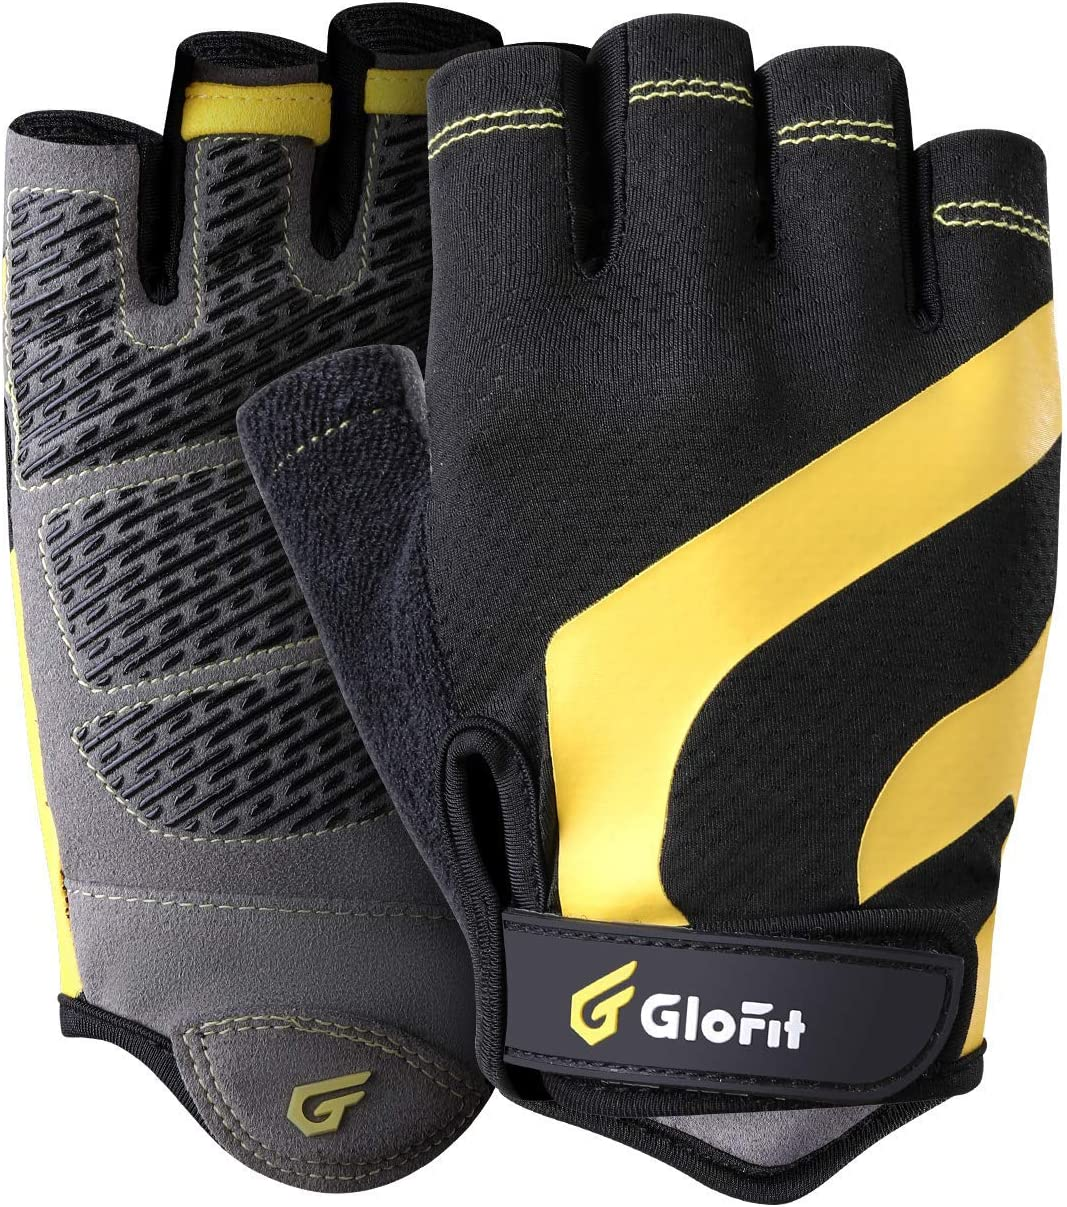 KANSOON GloFit Cycling Gloves